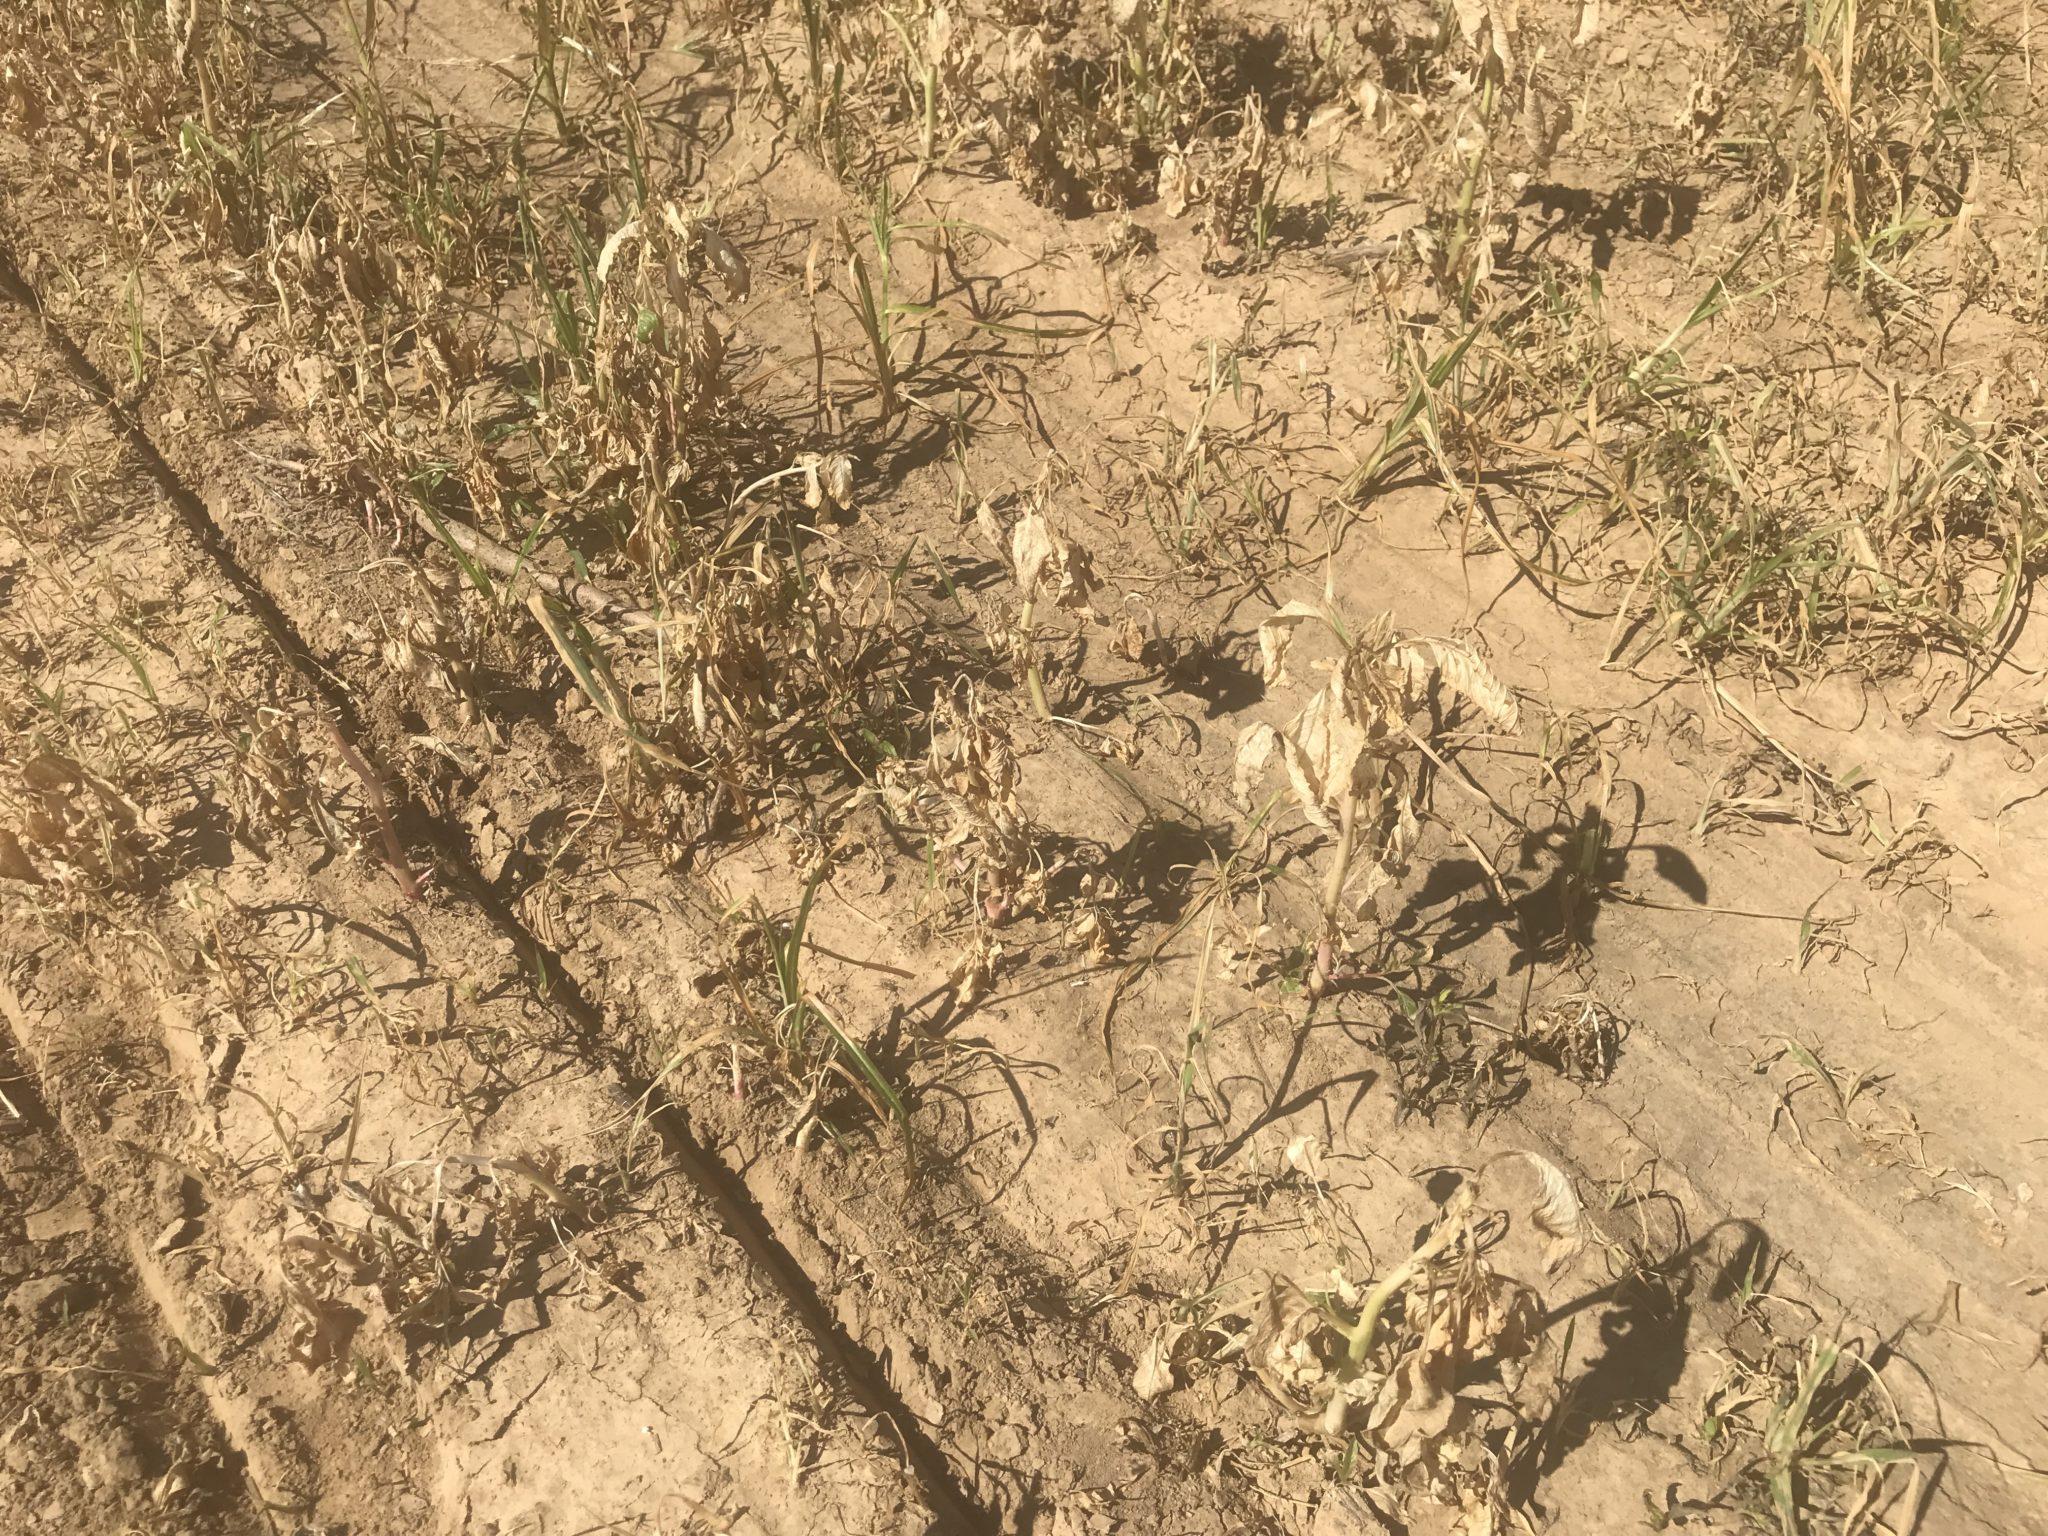 paraquat activity on weeds